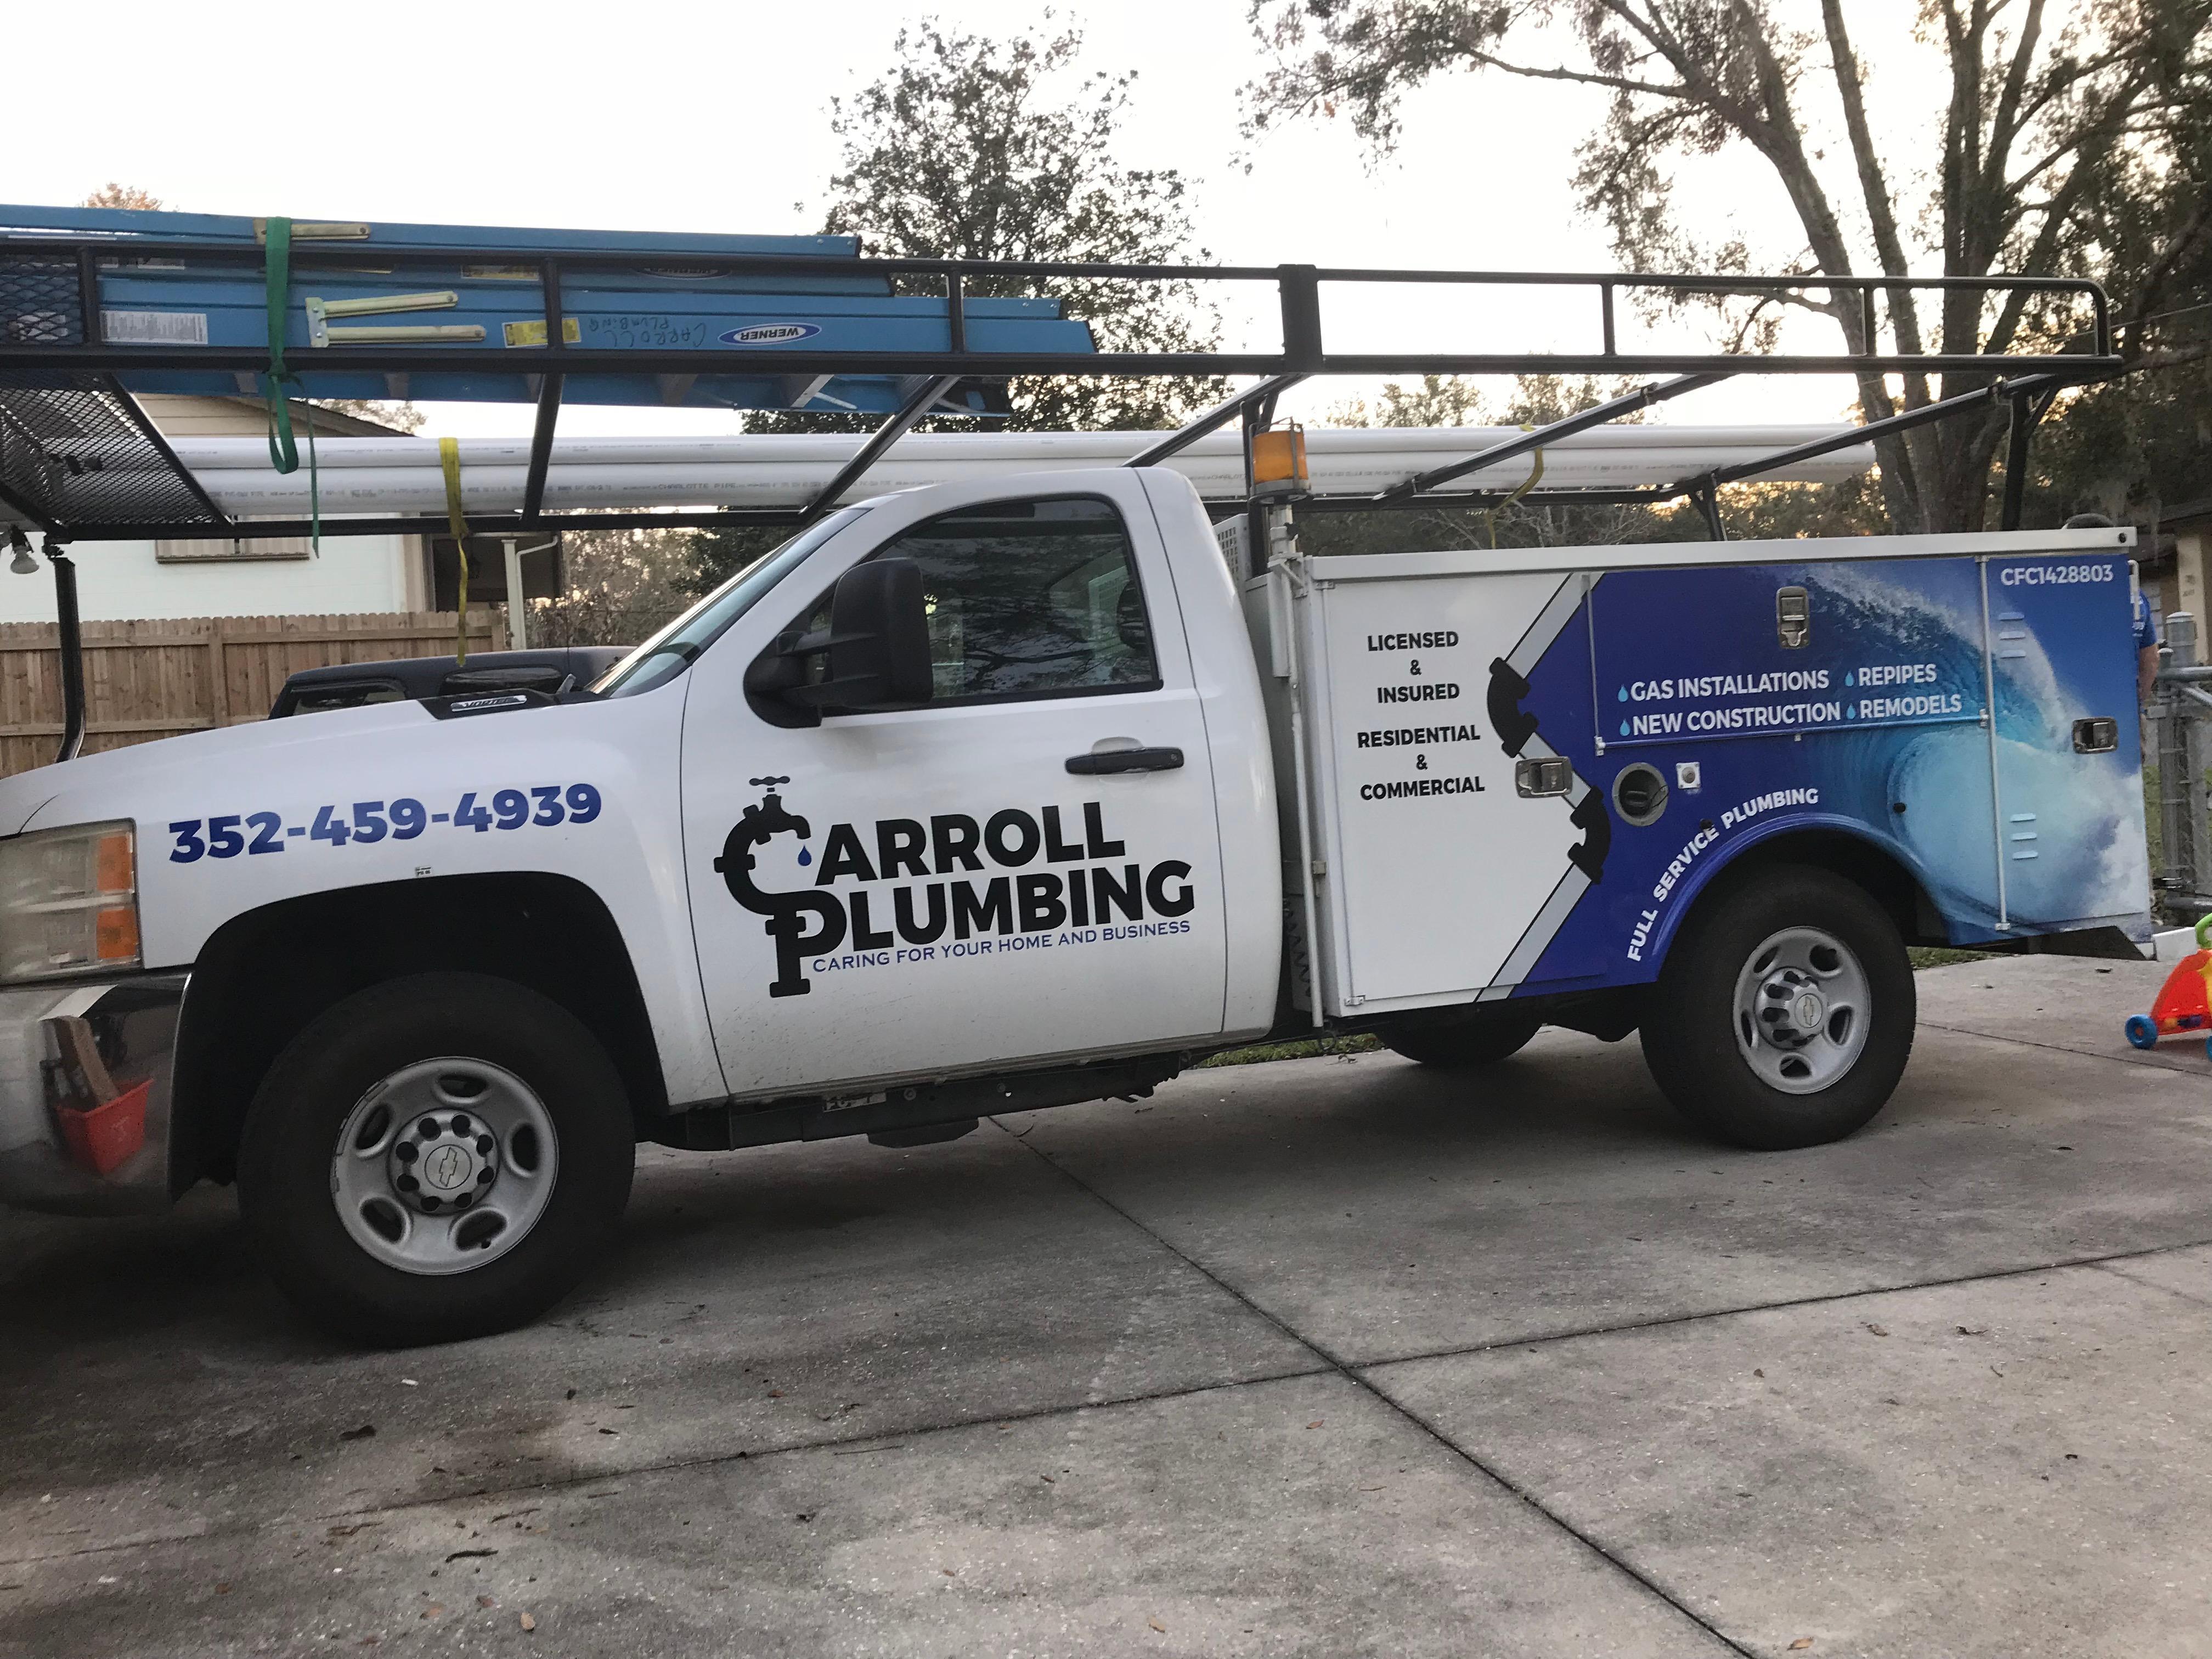 Carroll Plumbing, LLC image 0